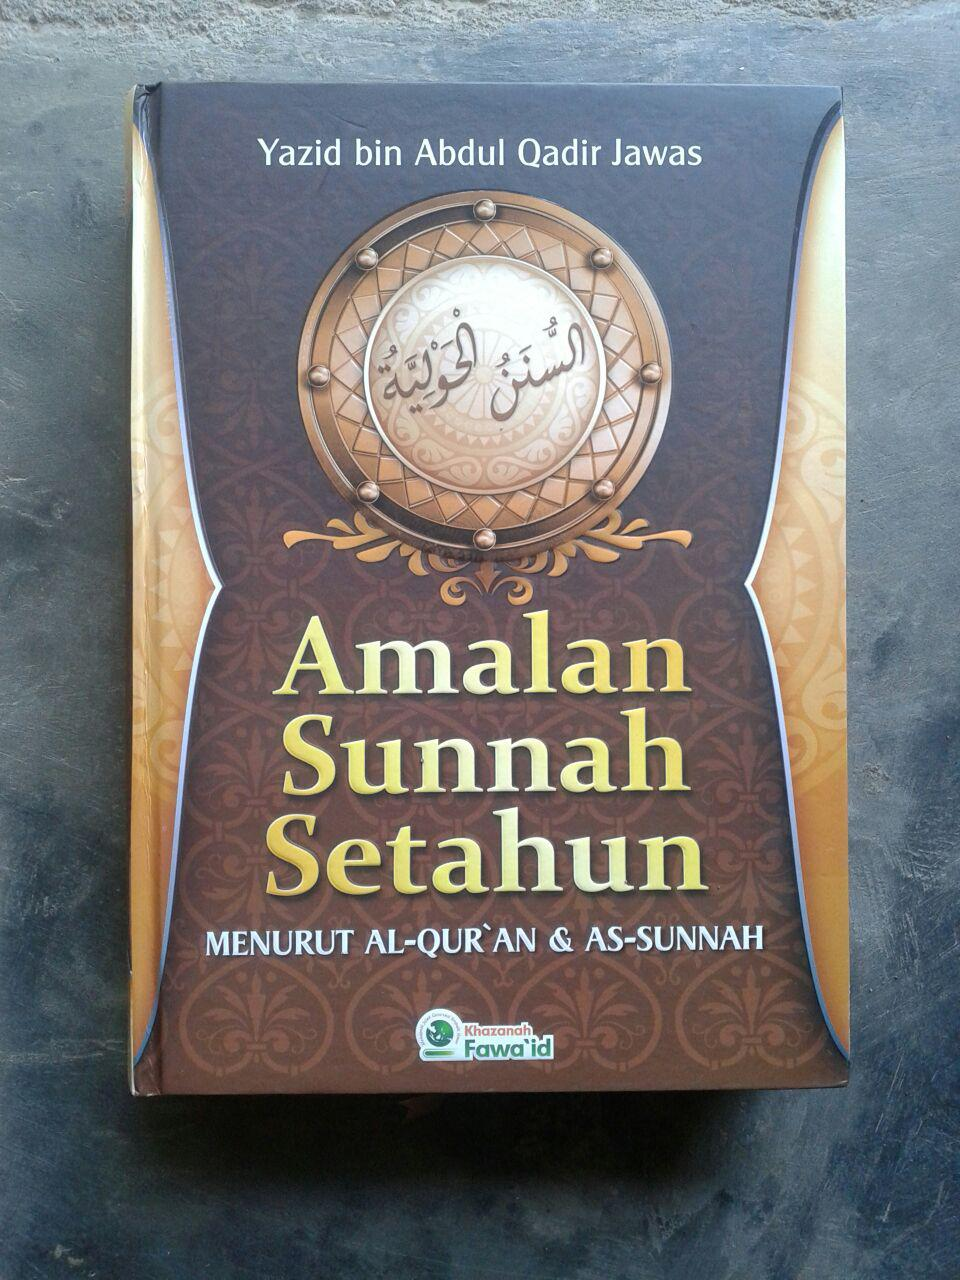 Buku Amalan Sunnah Setahun cover